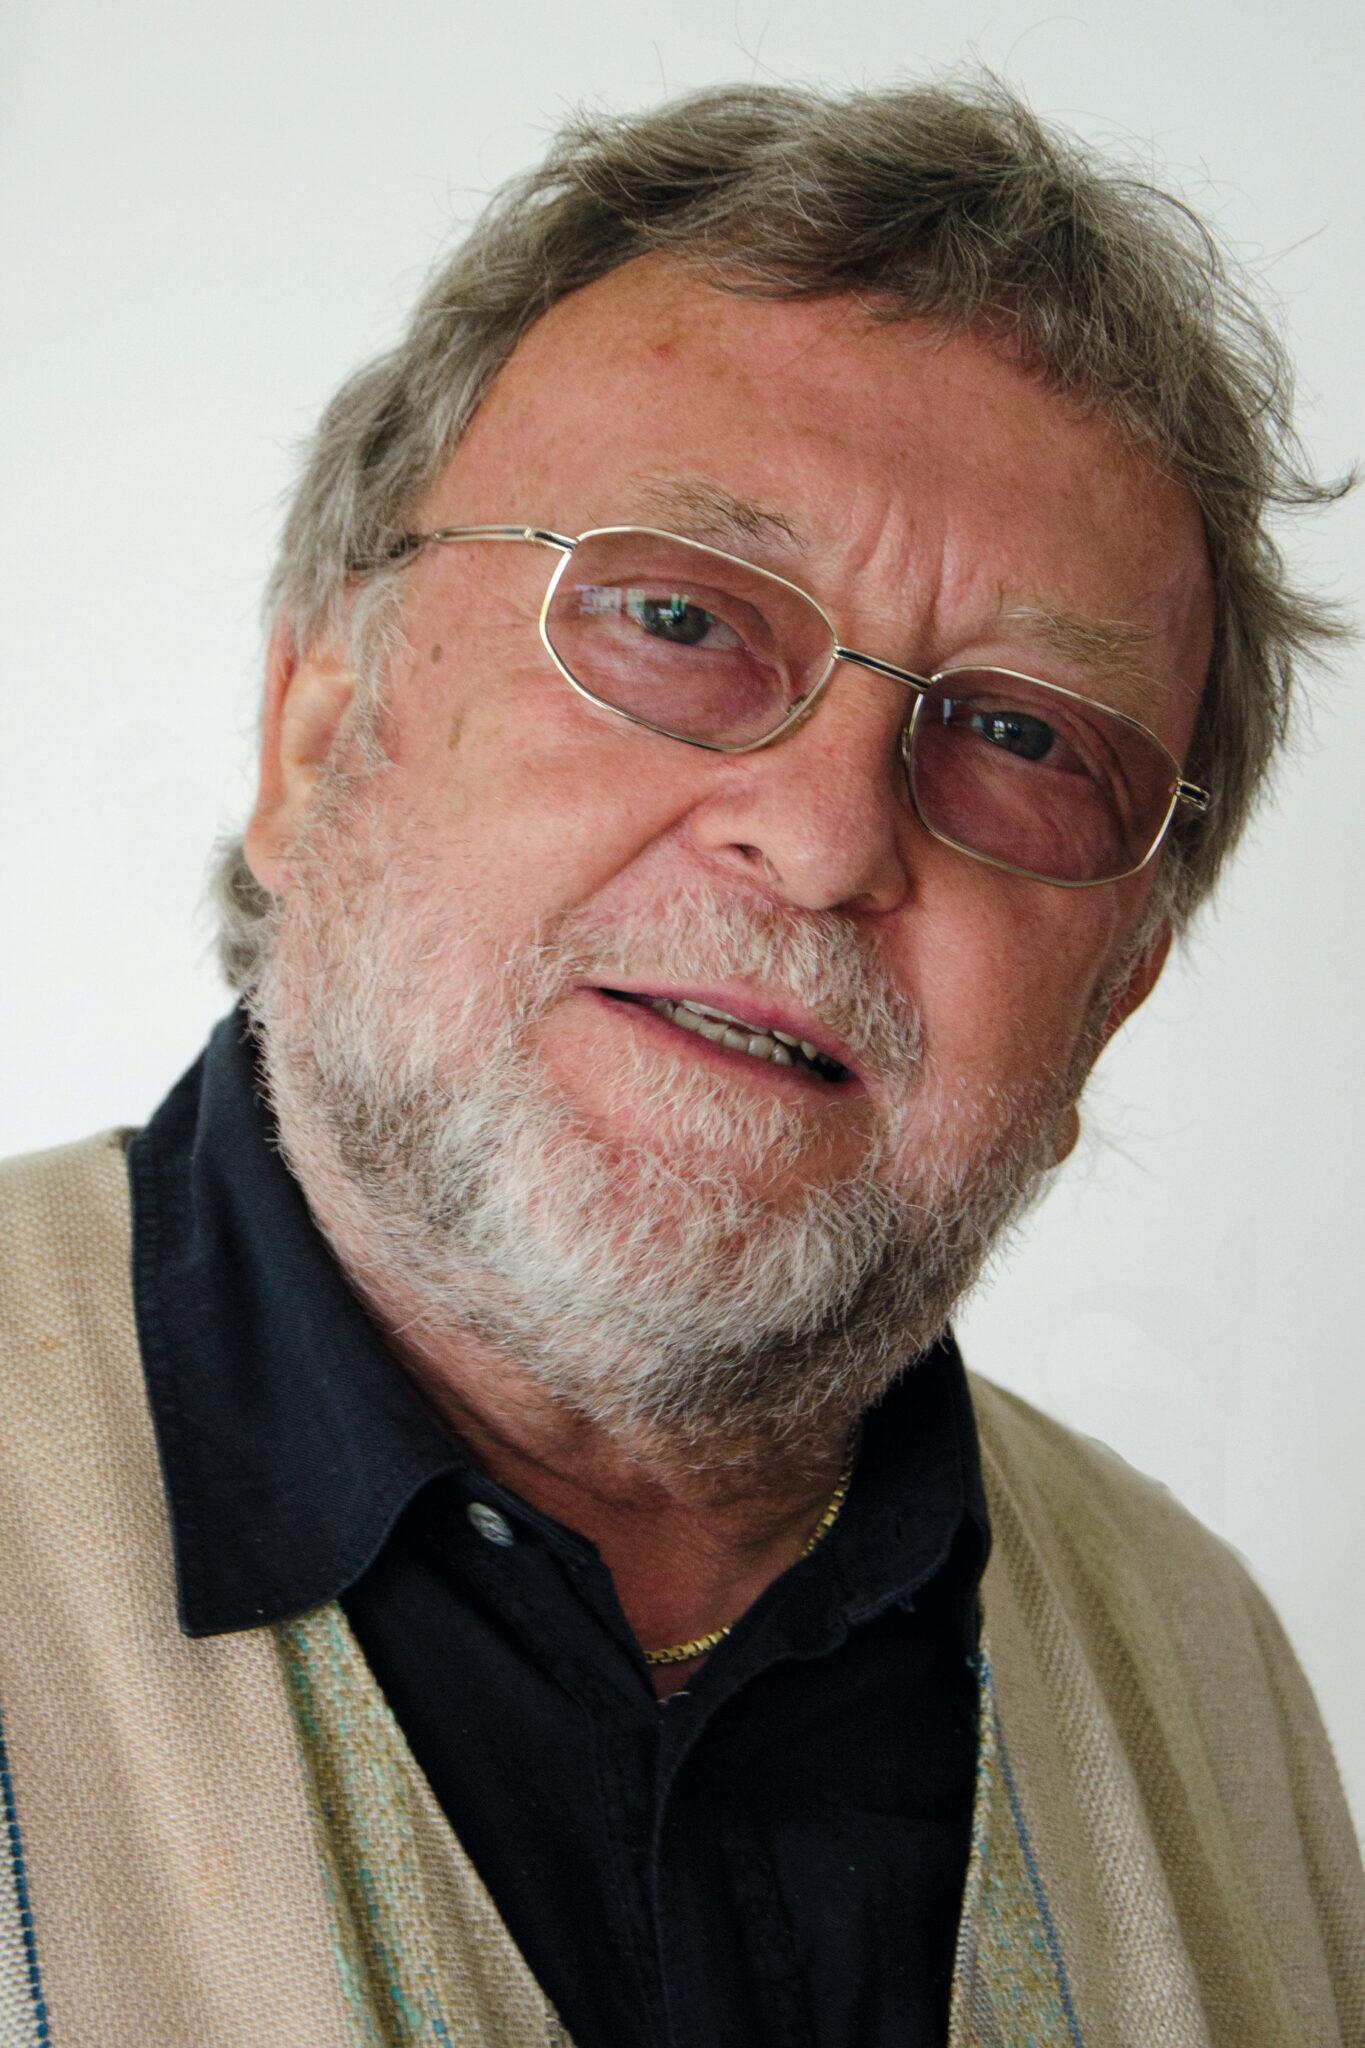 Pfr. i.R. Klaus Günter Stahlschmidt